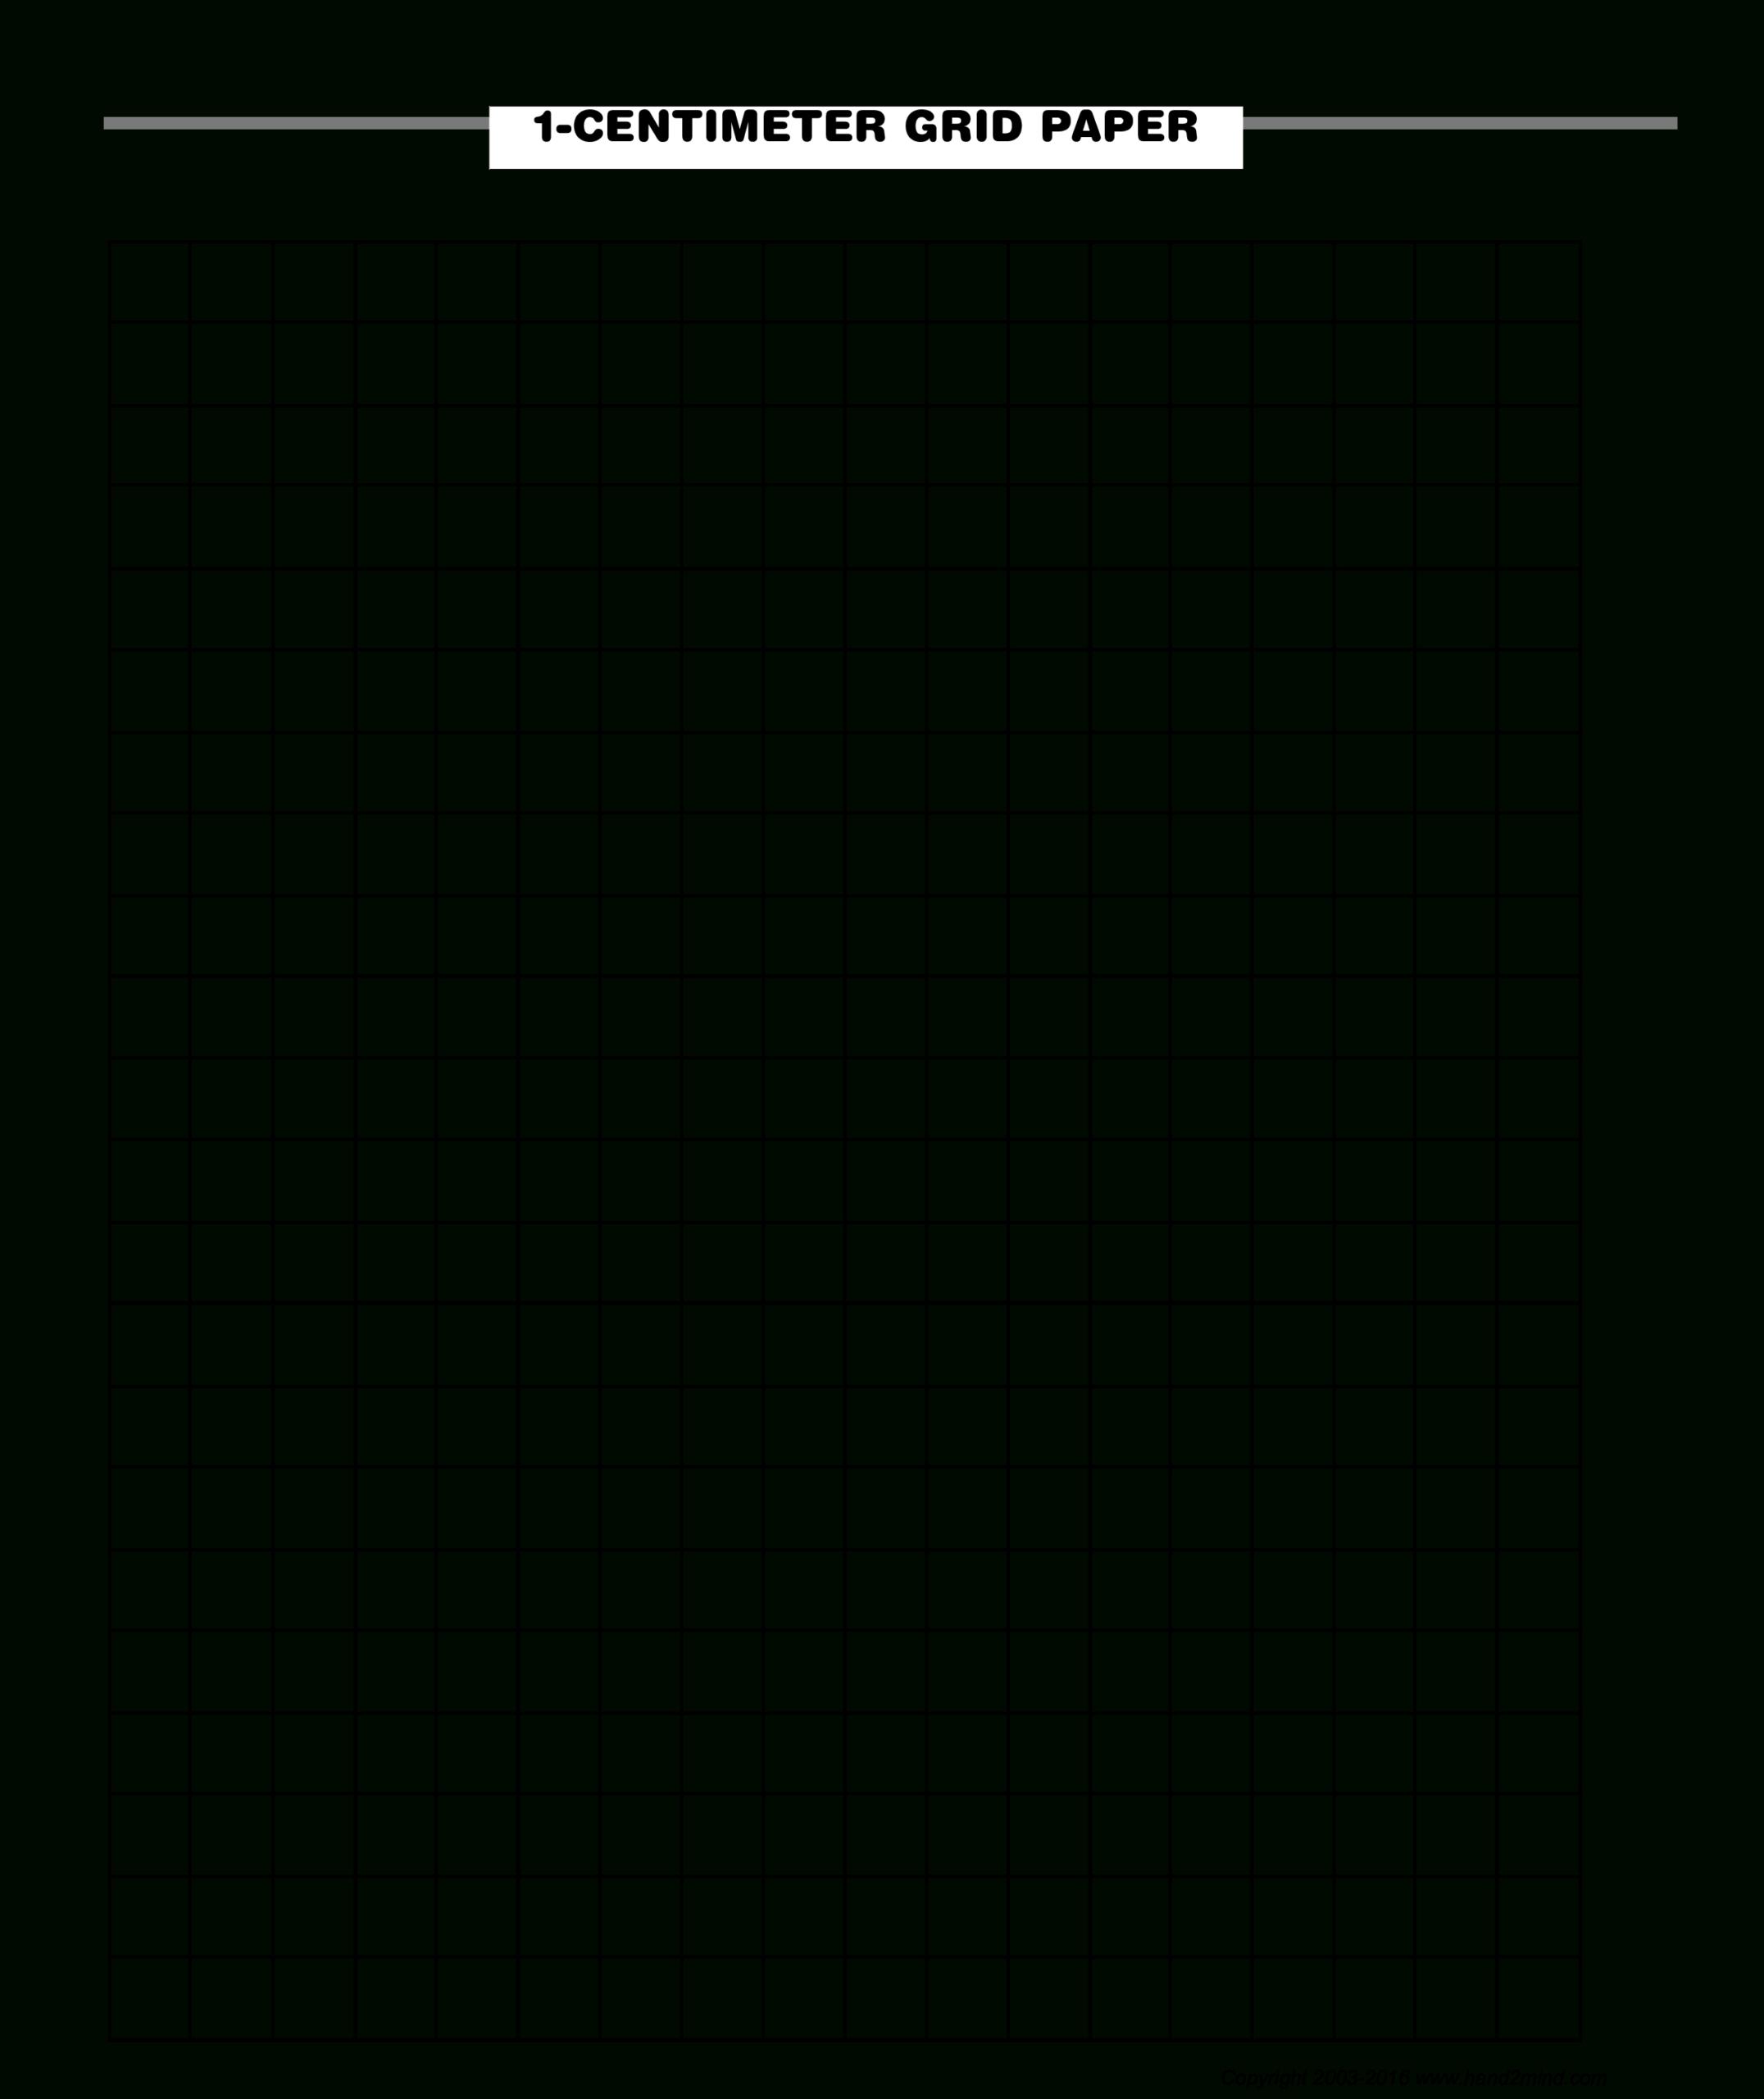 Cm Graph Paper Printable - Tomope.zaribanks.co Inside 1 Cm Graph Paper Template Word